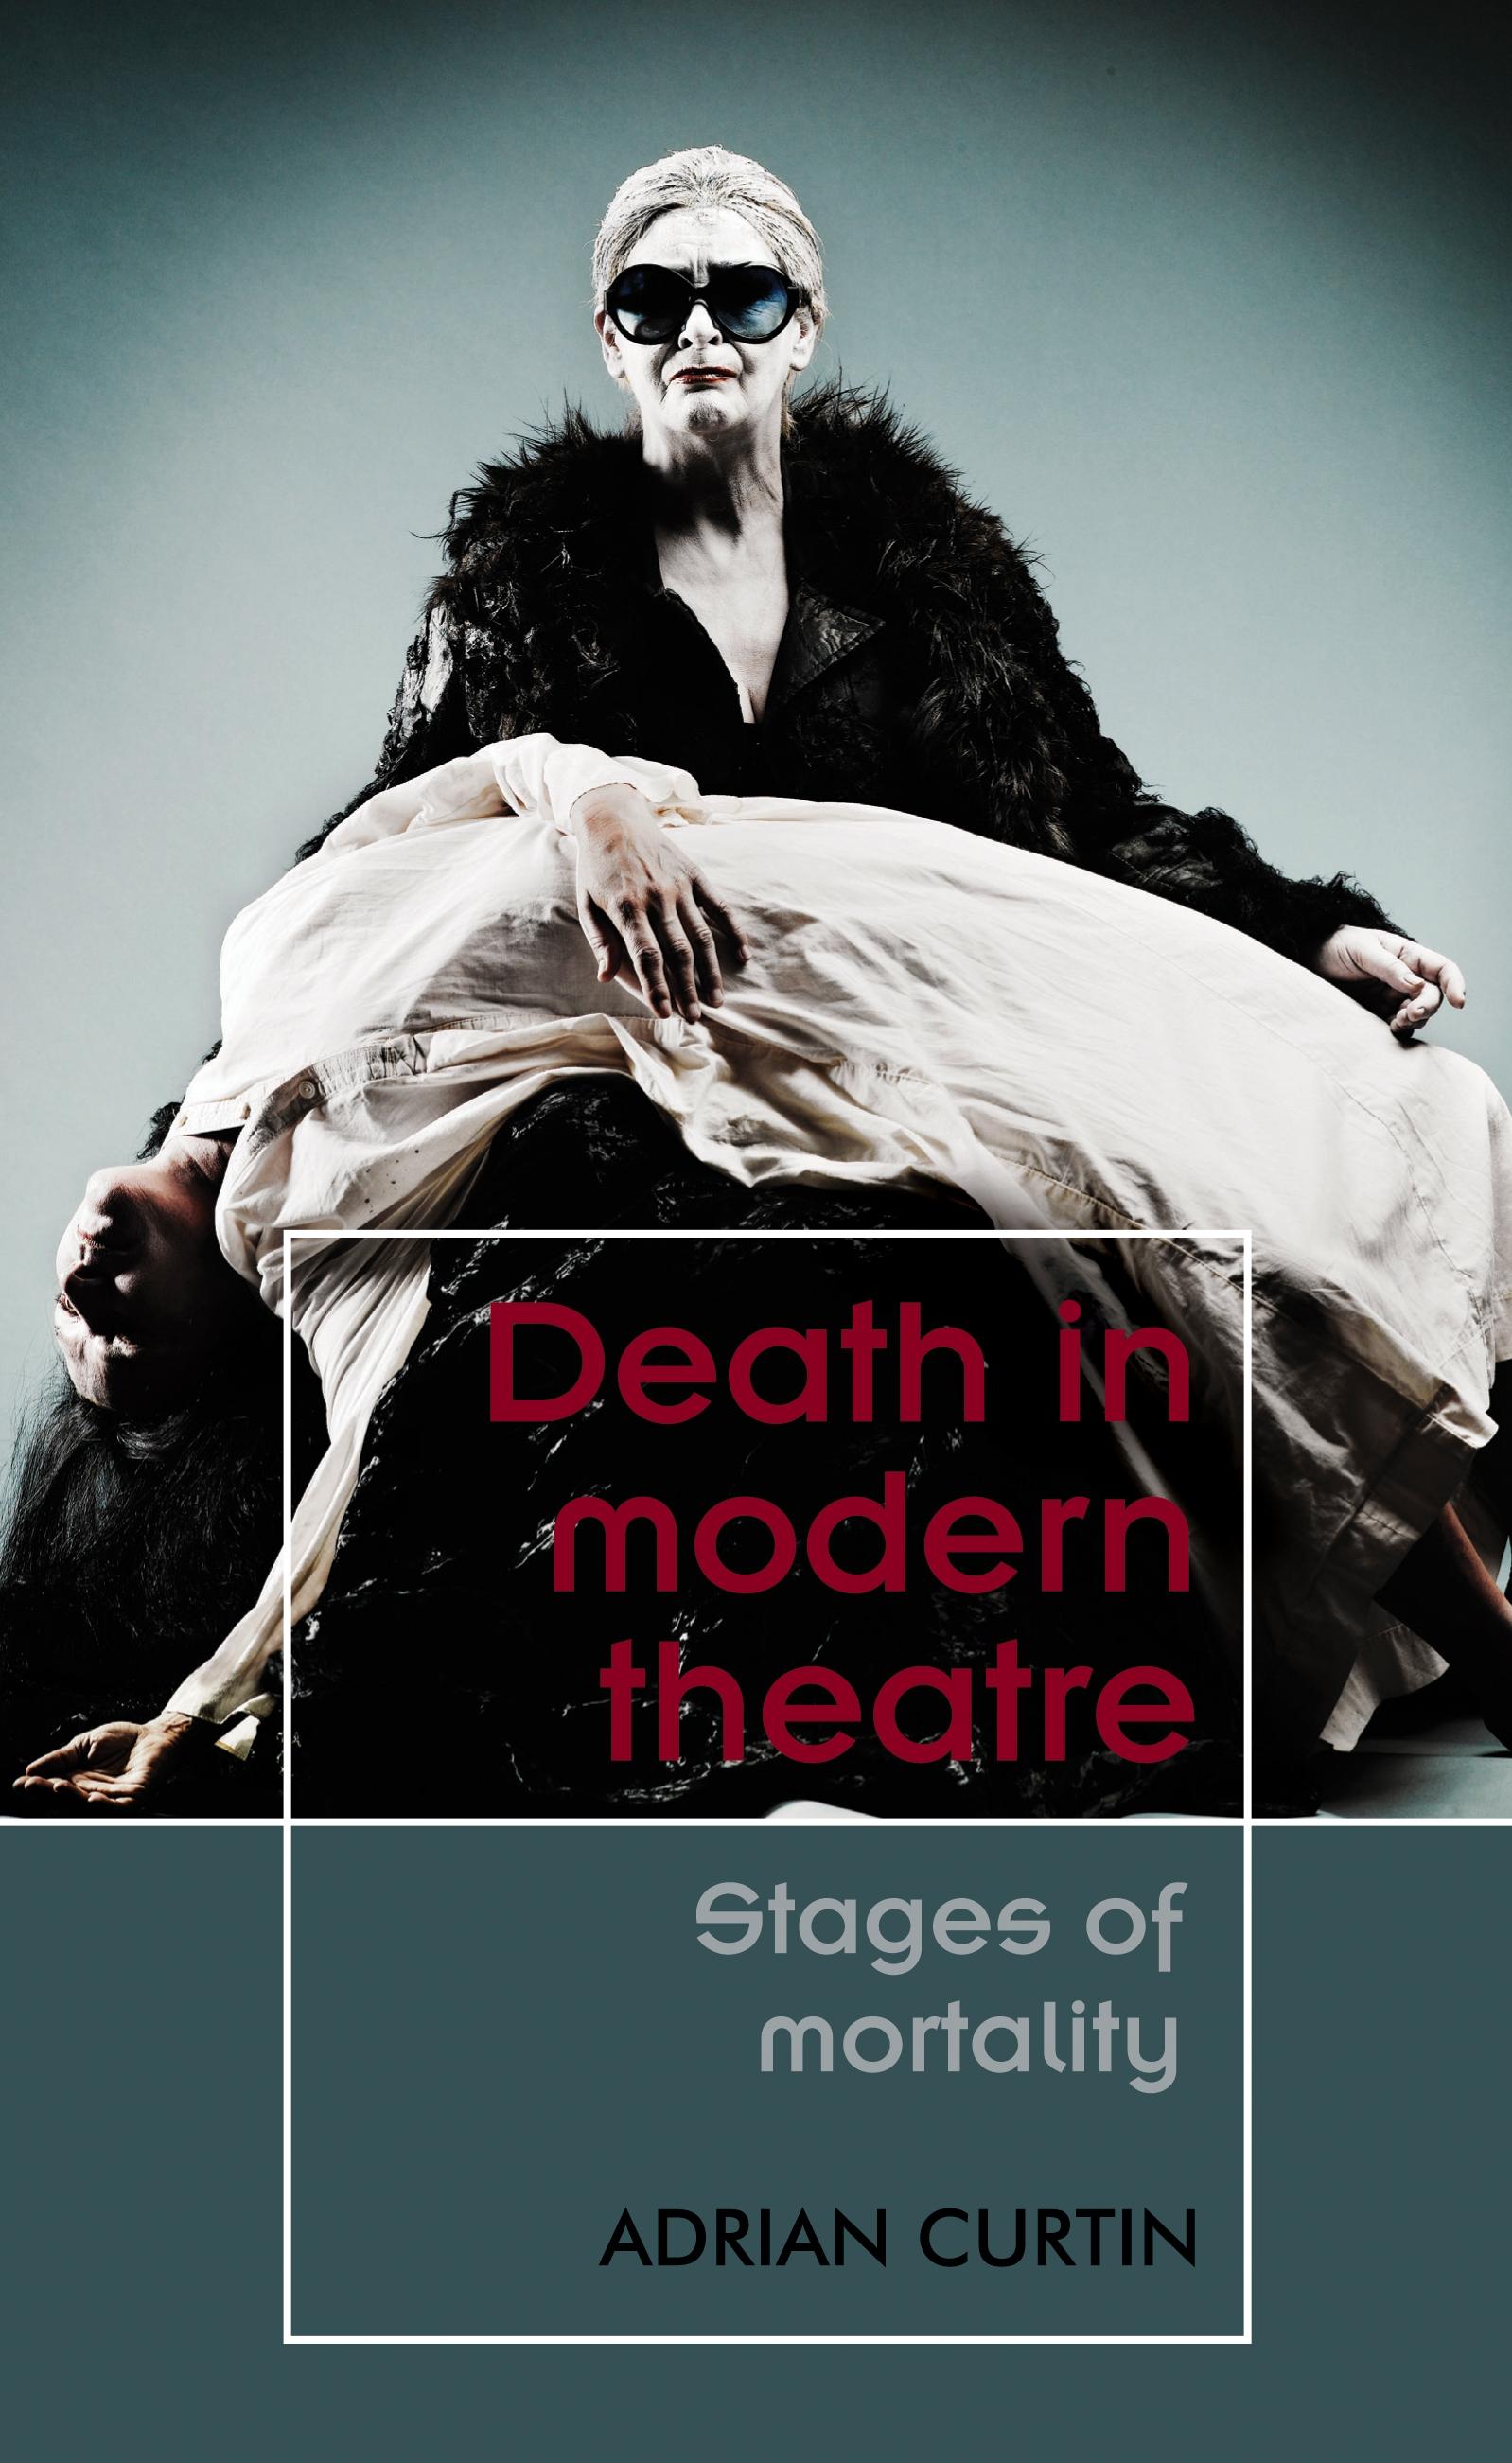 Death in modern theatre – Q&A with Adrian Curtin